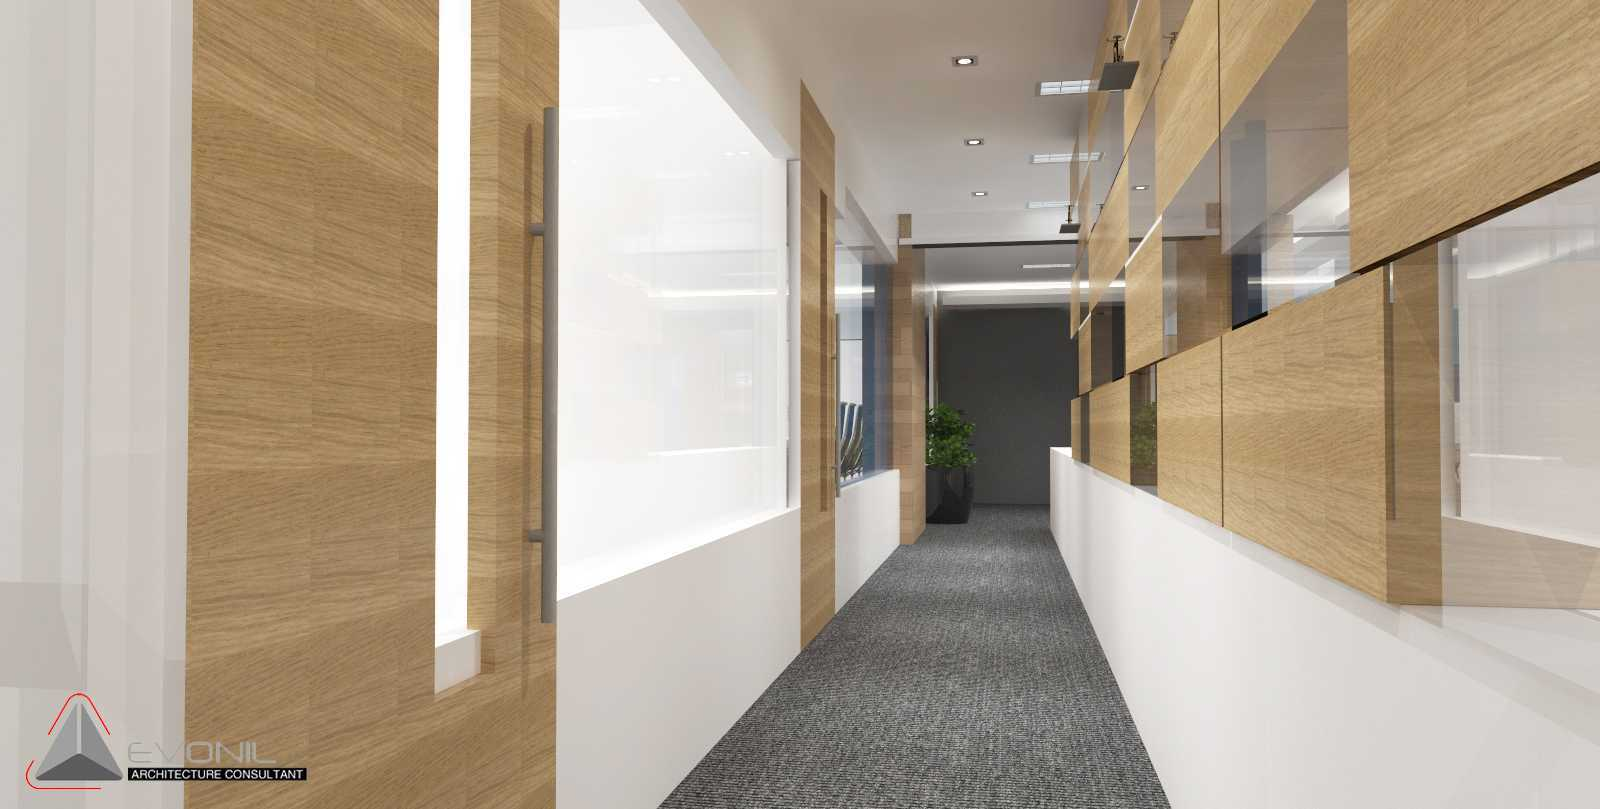 Evonil Architecture Unisat Group Office - Wisma Aldiron Gatot Subroto Jakarta, Daerah Khusus Ibukota Jakarta, Indonesia Jakarta, Daerah Khusus Ibukota Jakarta, Indonesia Evonil-Architecture-Unisat-Group-Office-Wisma-Aldiron-Gatot-Subroto  77978